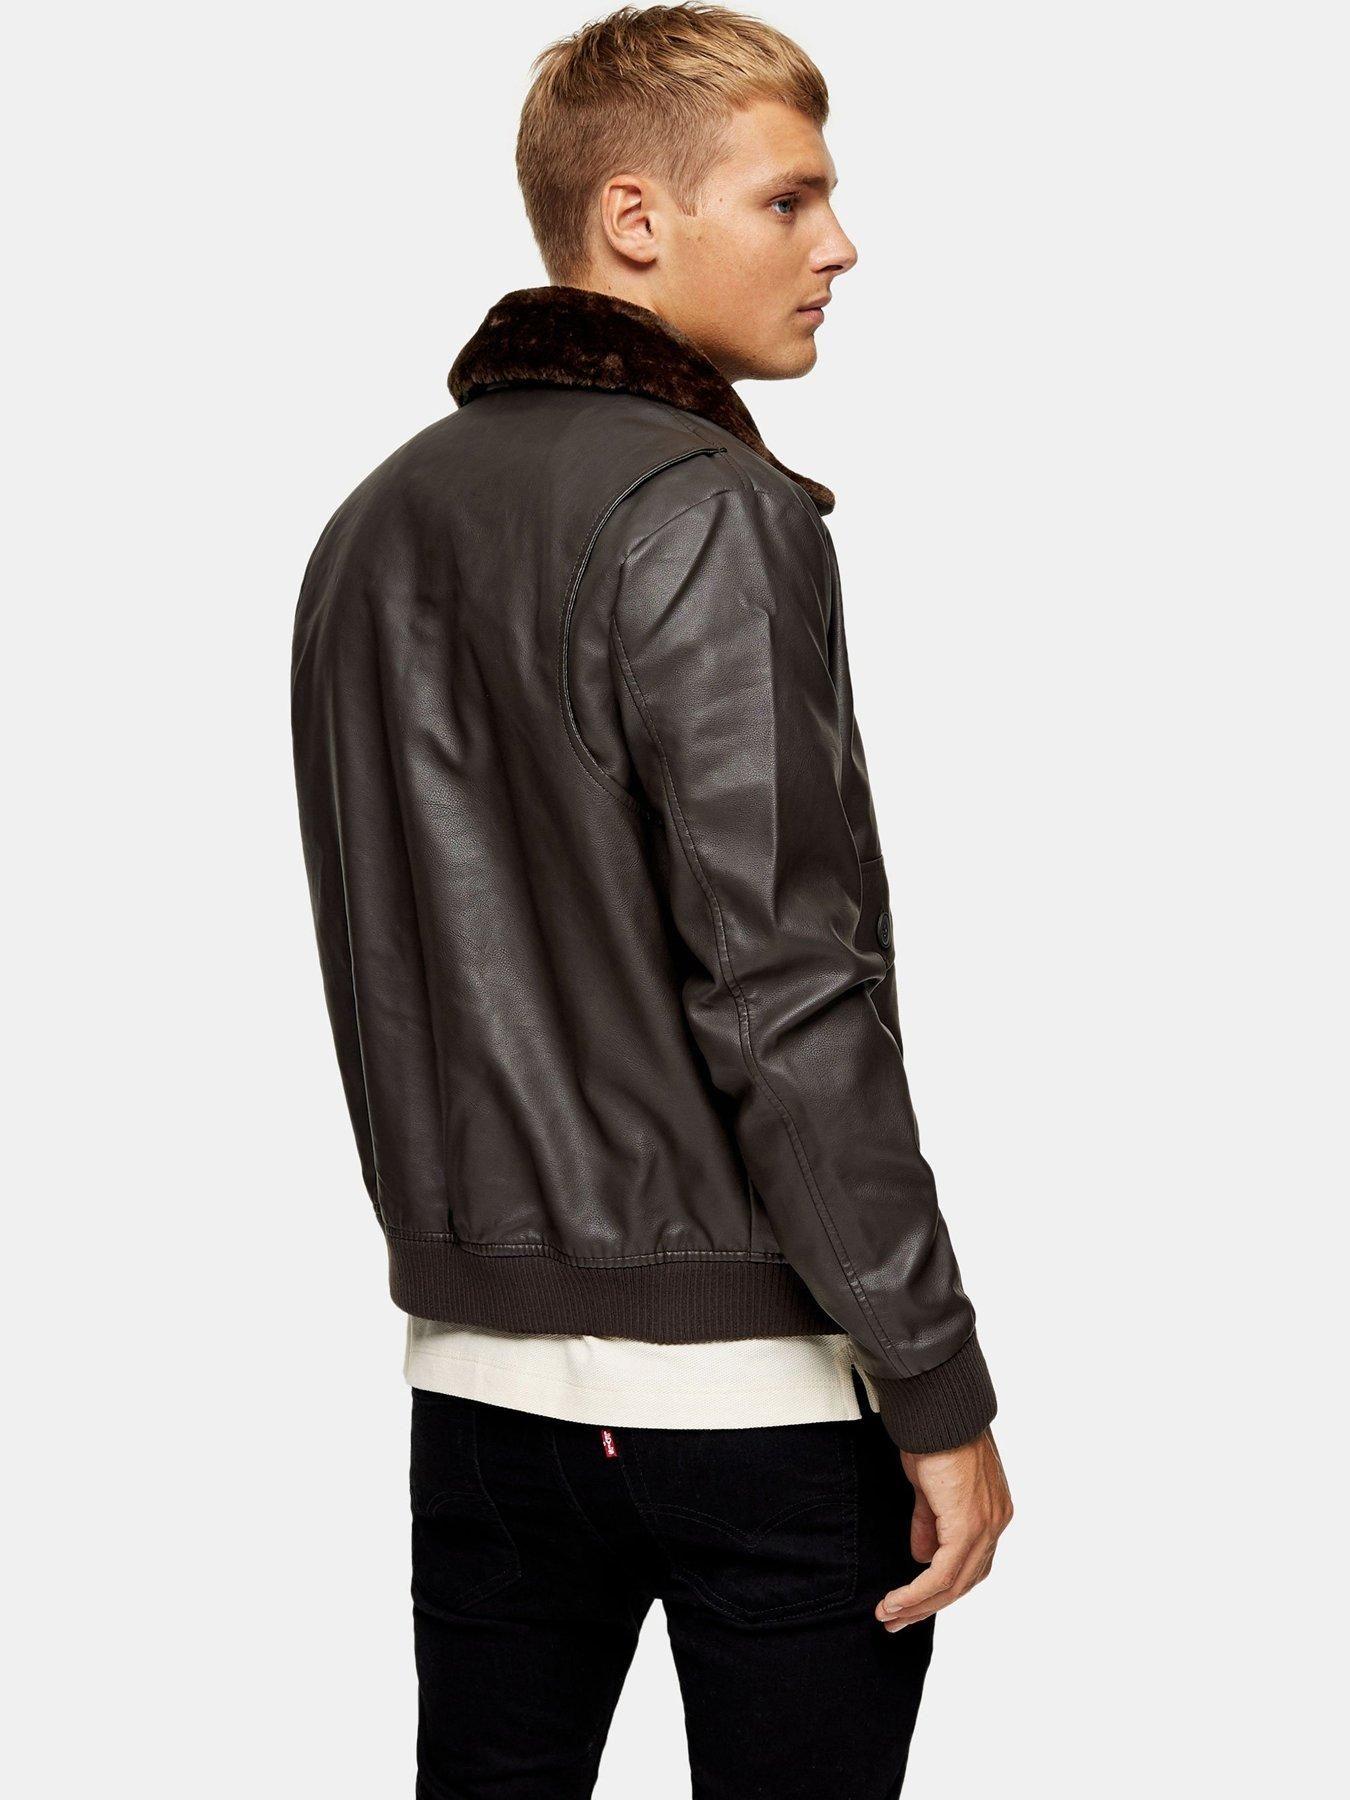 Topman Topman Faux Leather Fur Collar Flight Jacket, Brown